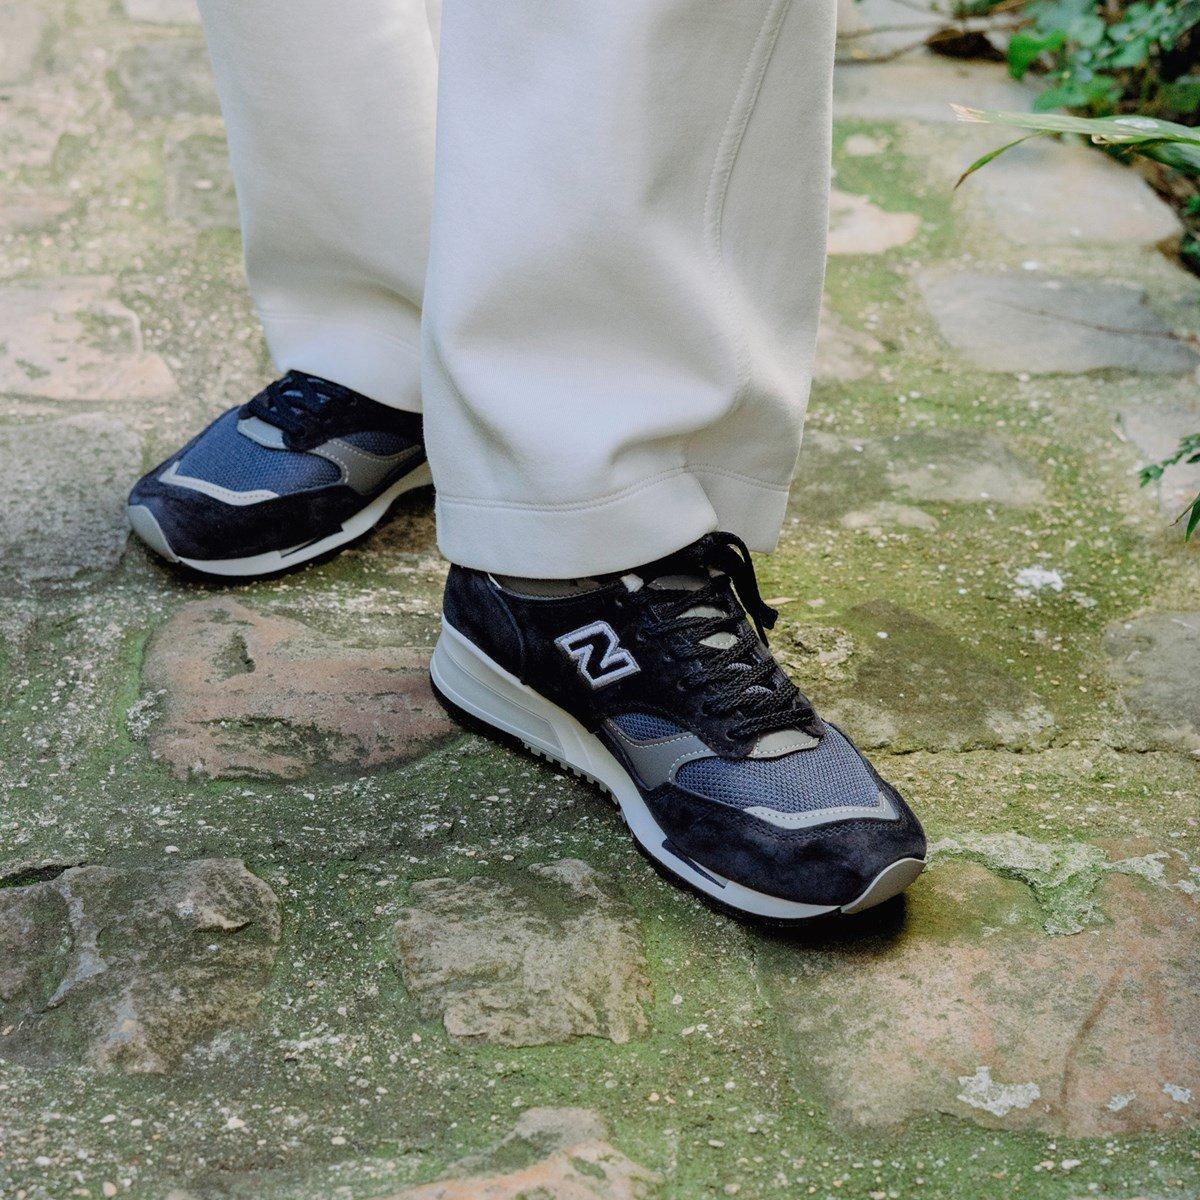 New Balance 1500 - M1500pnv - SNS | sneakers & streetwear online ...